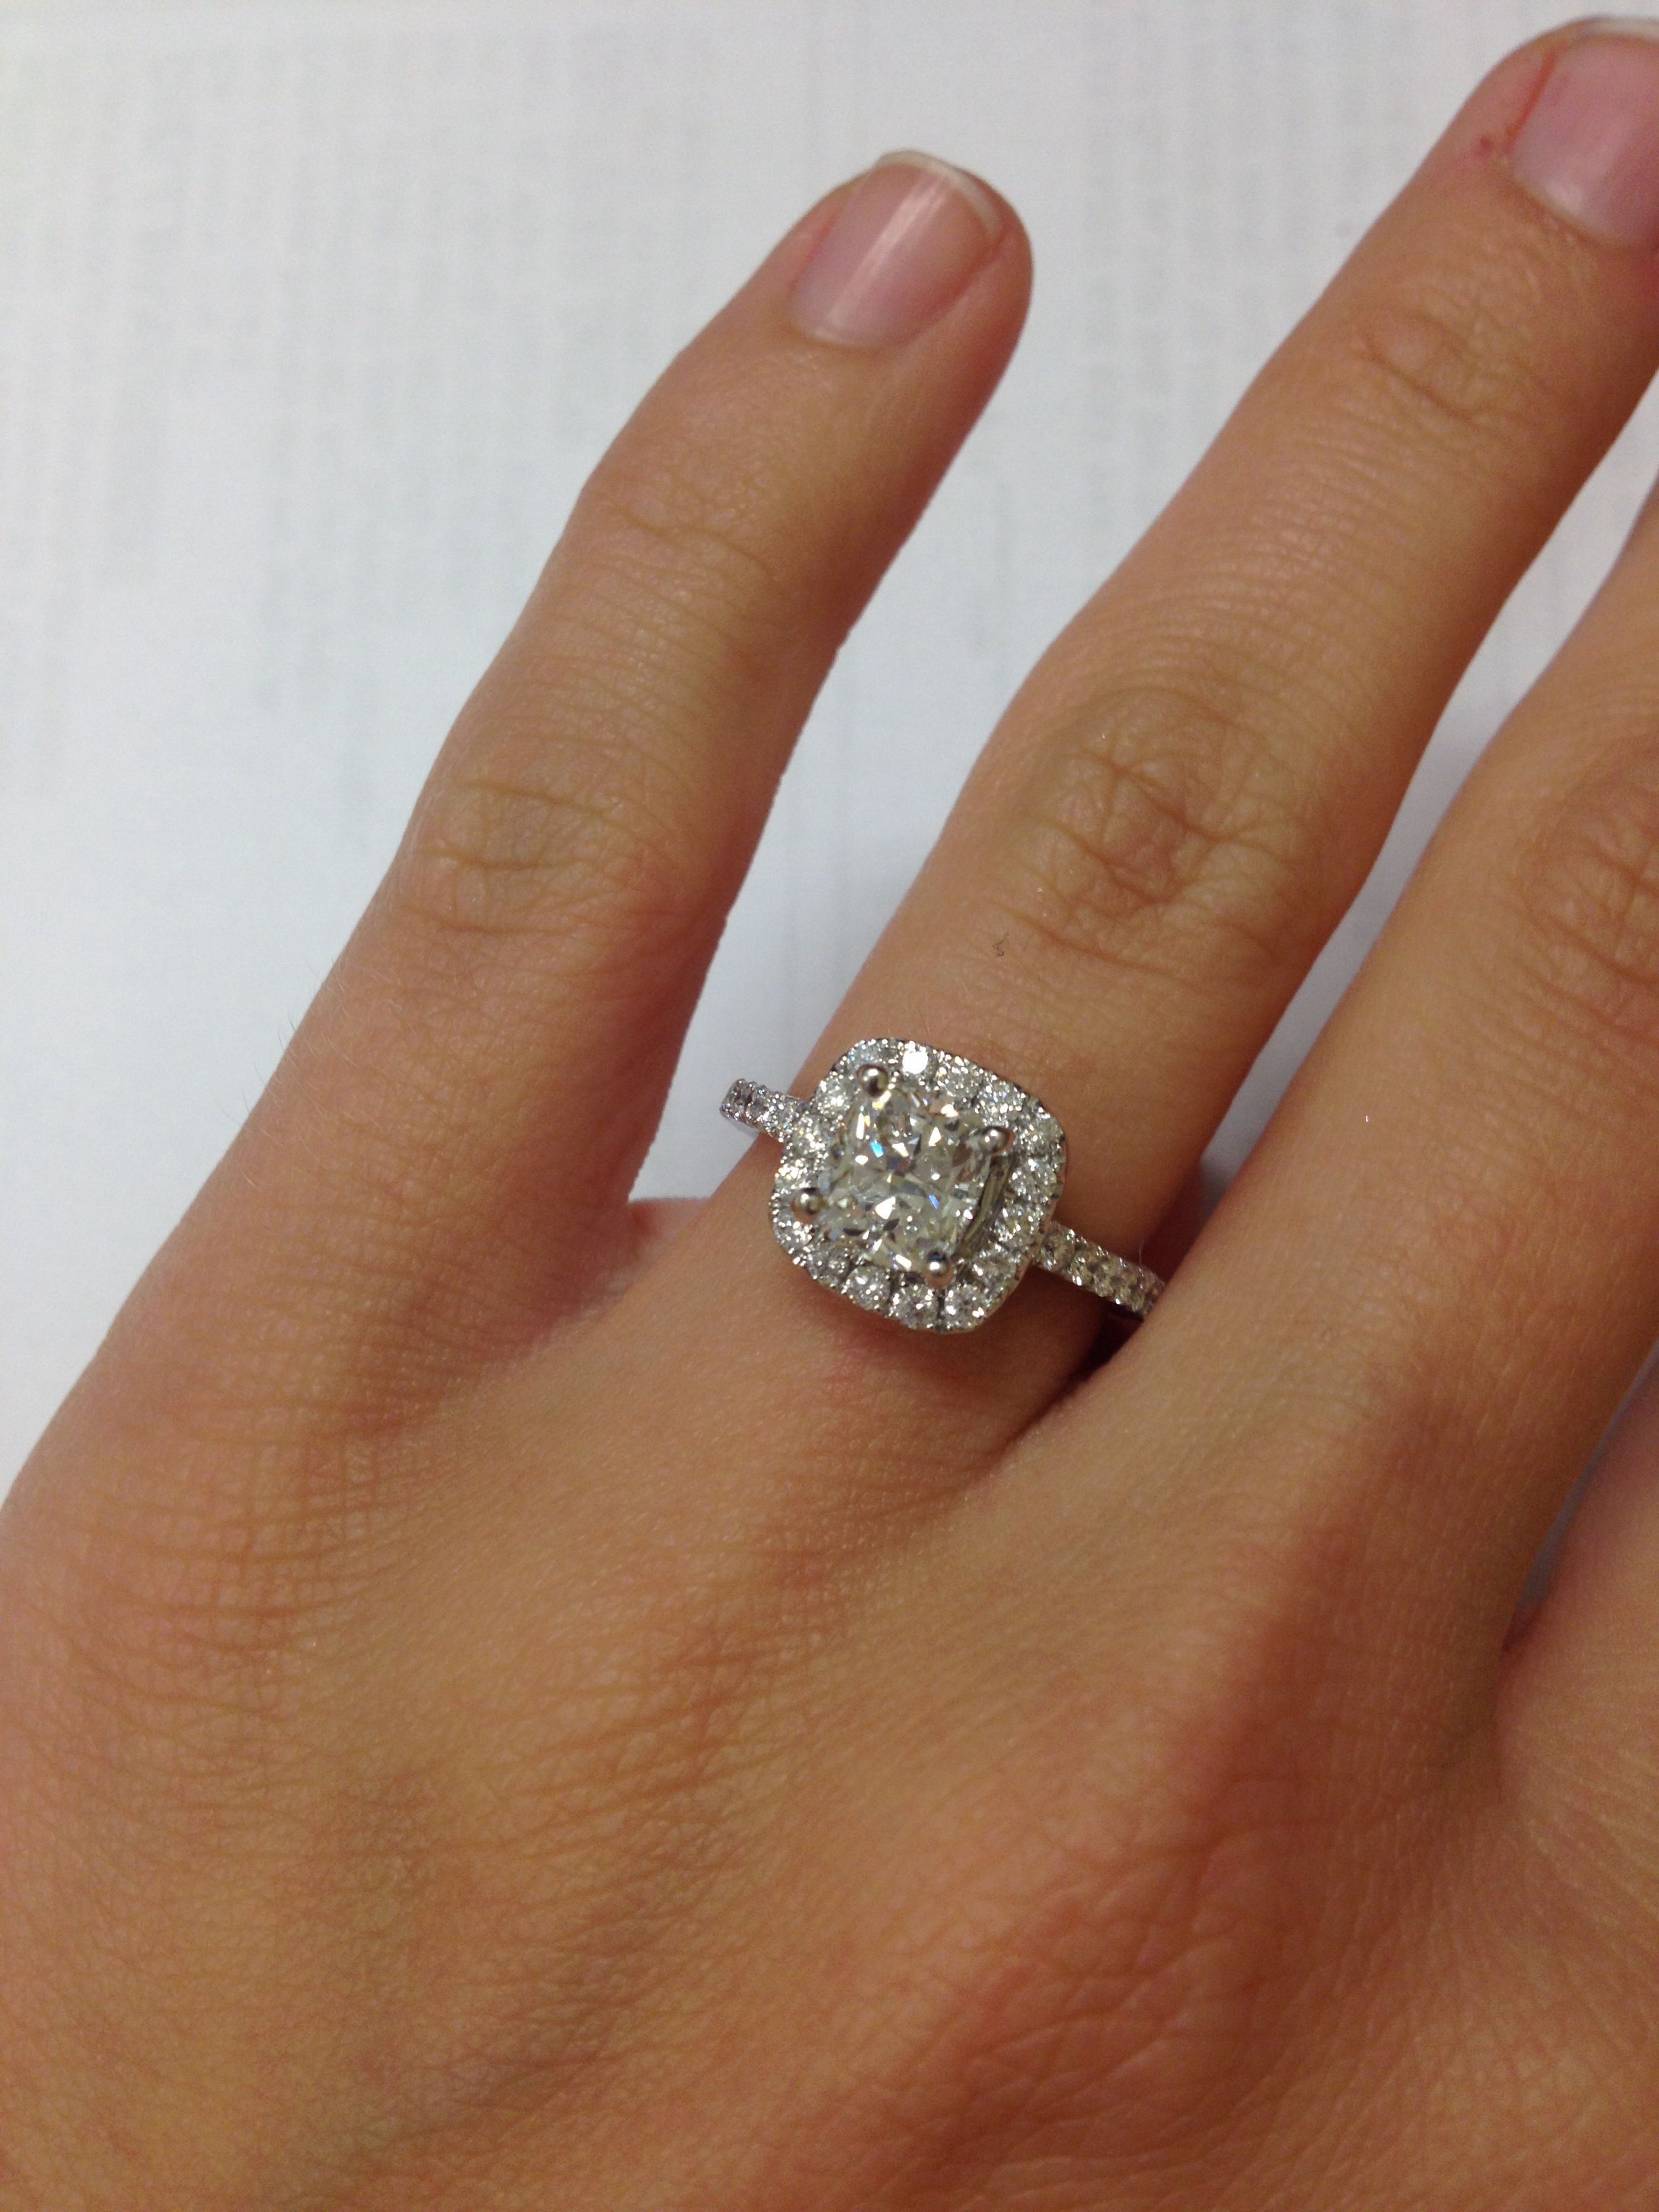 348ae5693f91 Cushion cut engagement ring!